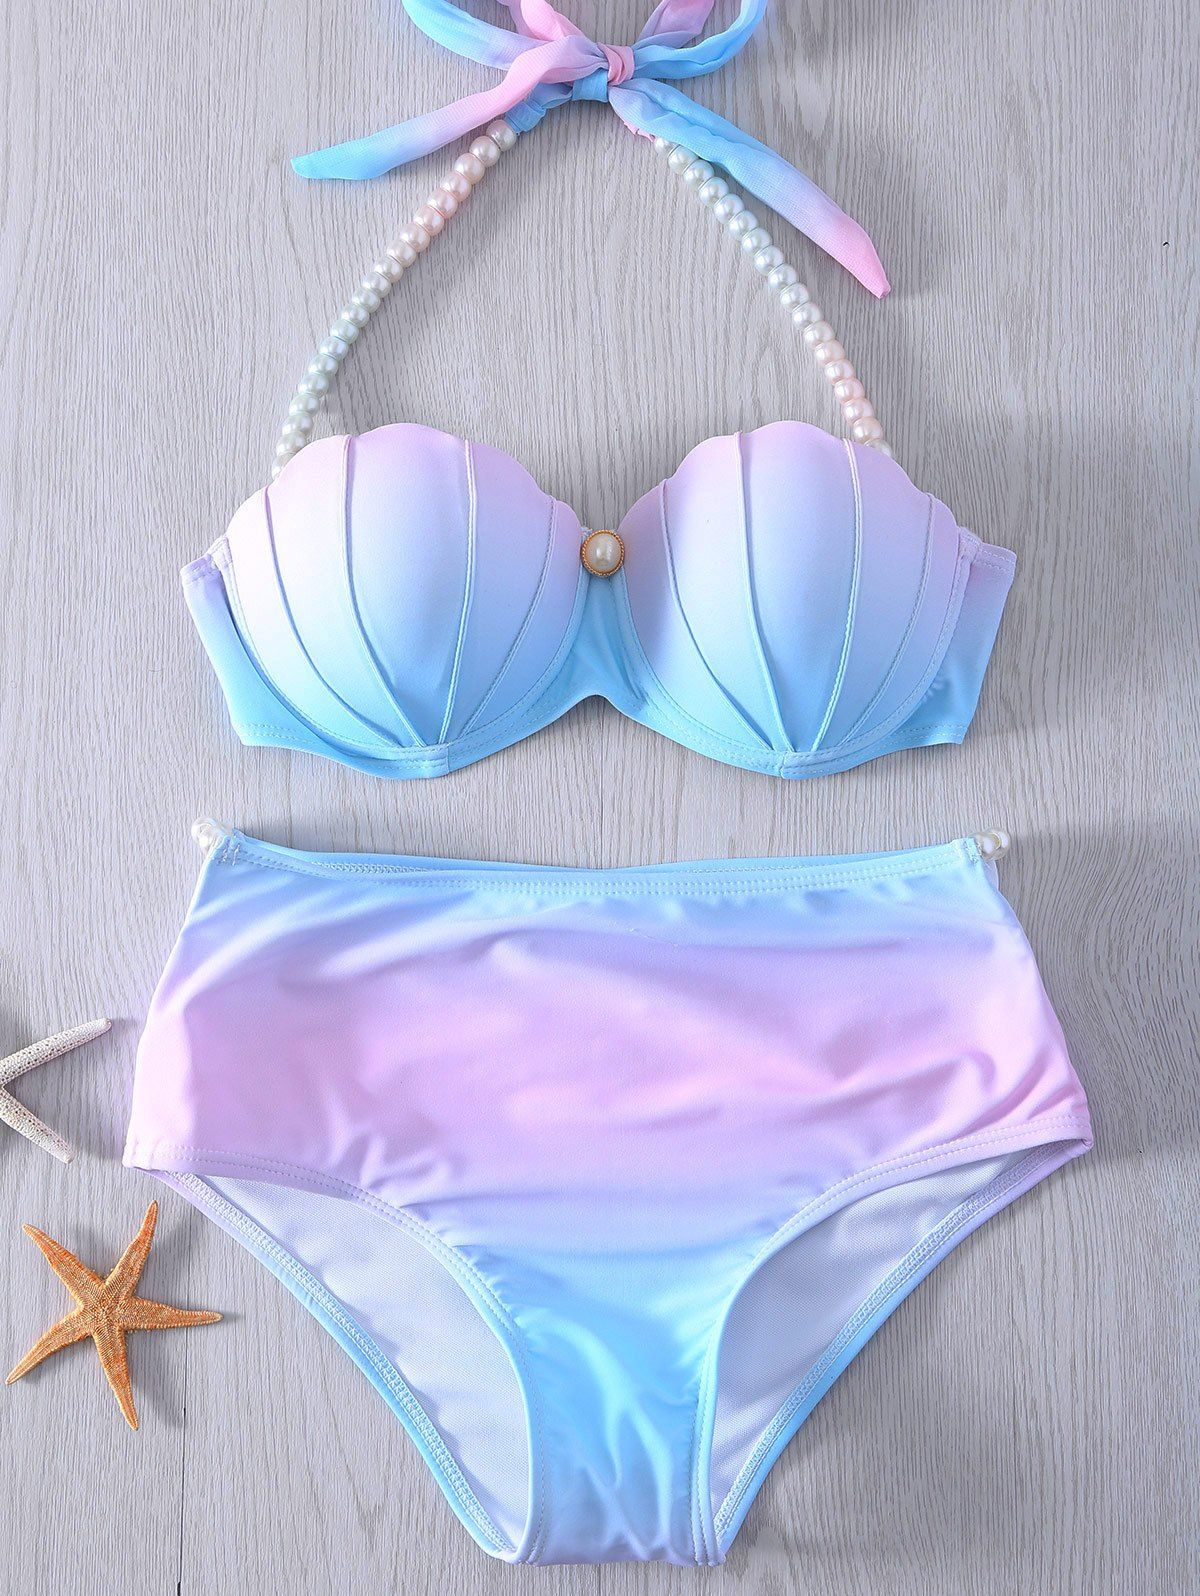 307ddbf9d956f Stylish Halter Neck Tie Dye High Waist Pearl Embellished Bikini Set For  Women